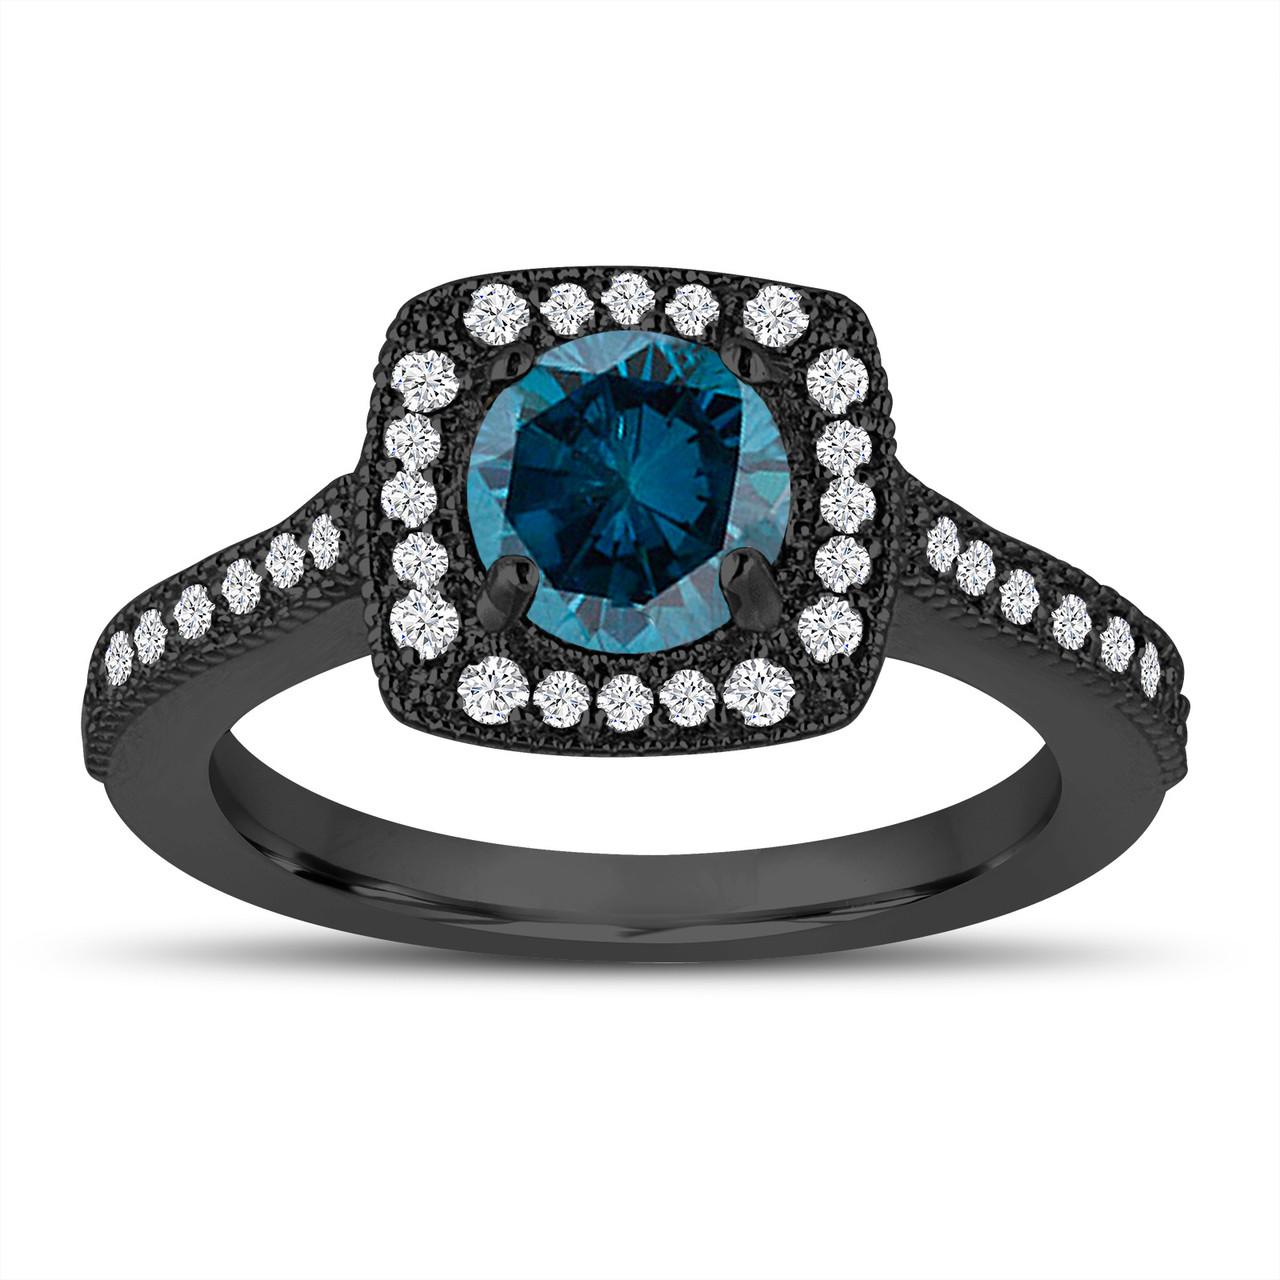 Vintage Style Blue Diamond Engagement Ring Wedding Ring 1 29 Carat 14k Black Gold Halo Pave Certified Handmade